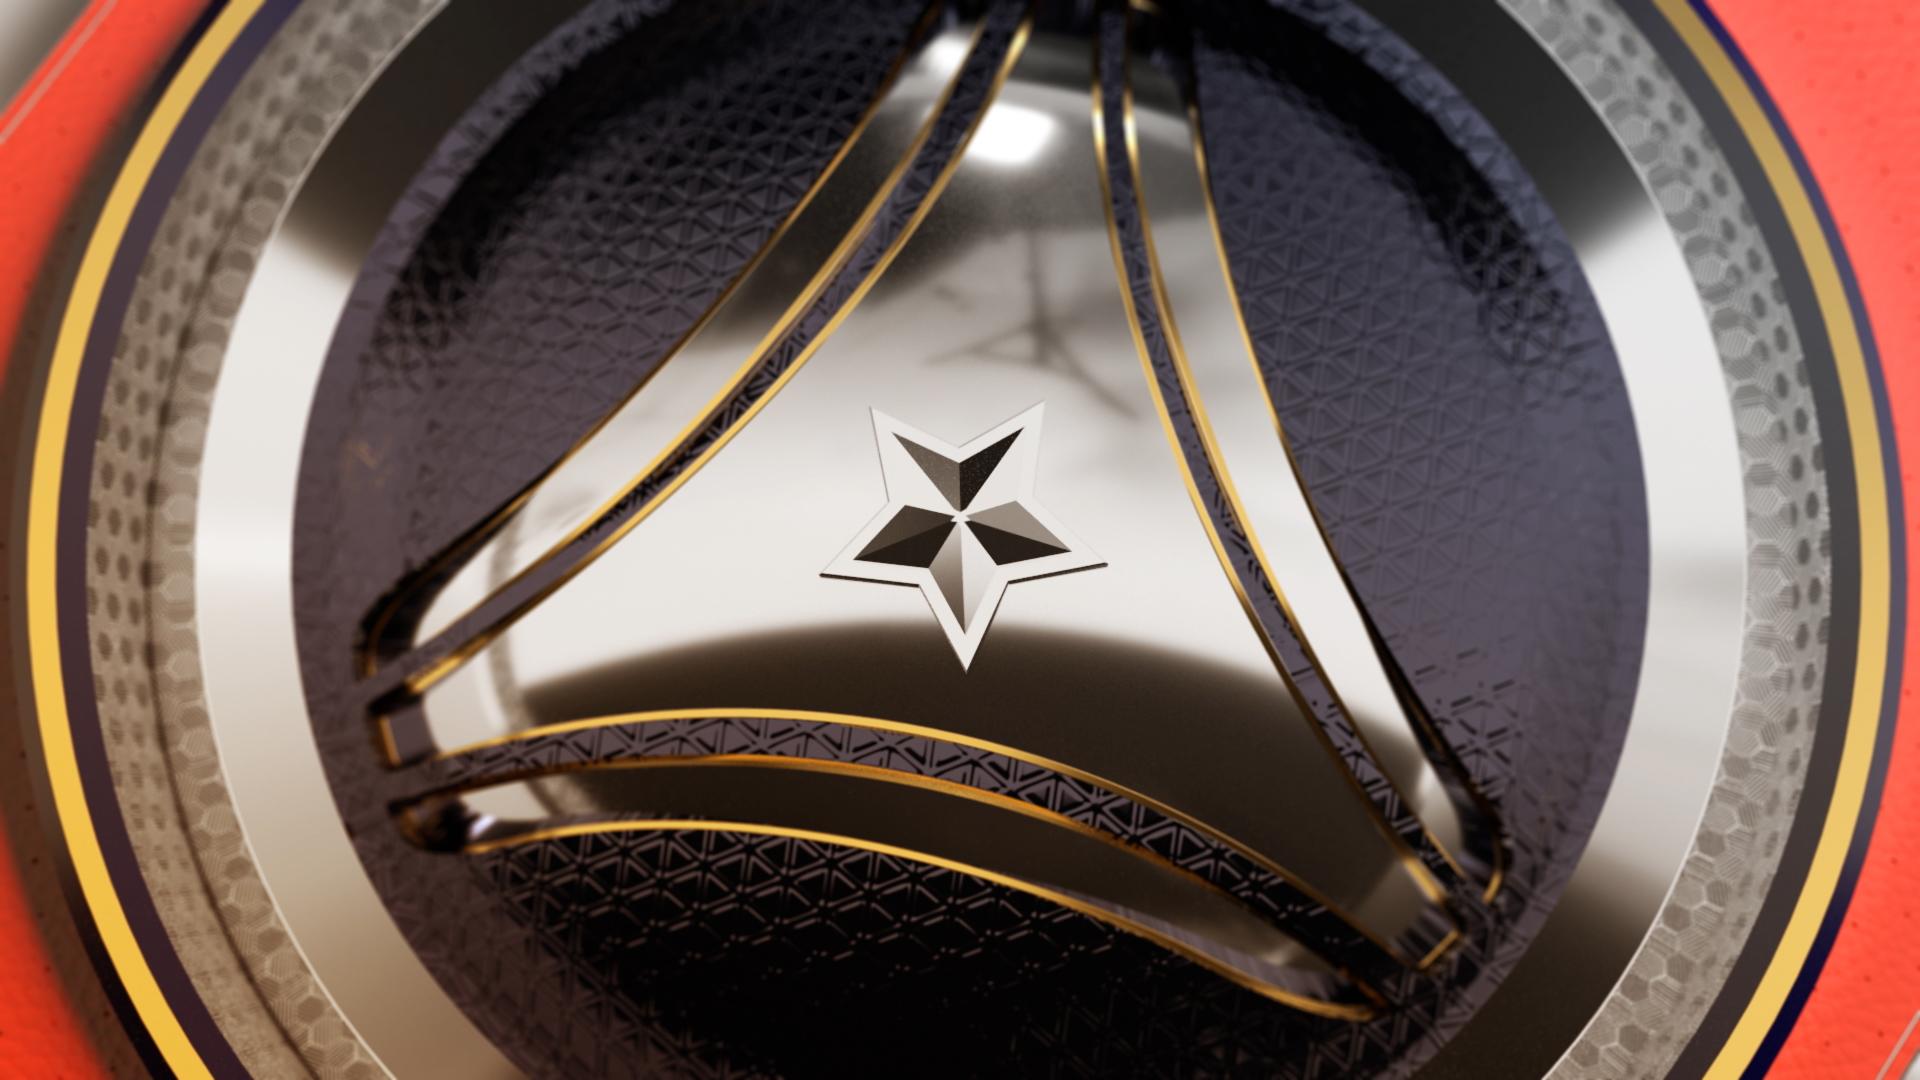 branding-cabecera-orgullo-de-medalla-olimpiadas-3-rtve-1920x1080-1.jpg